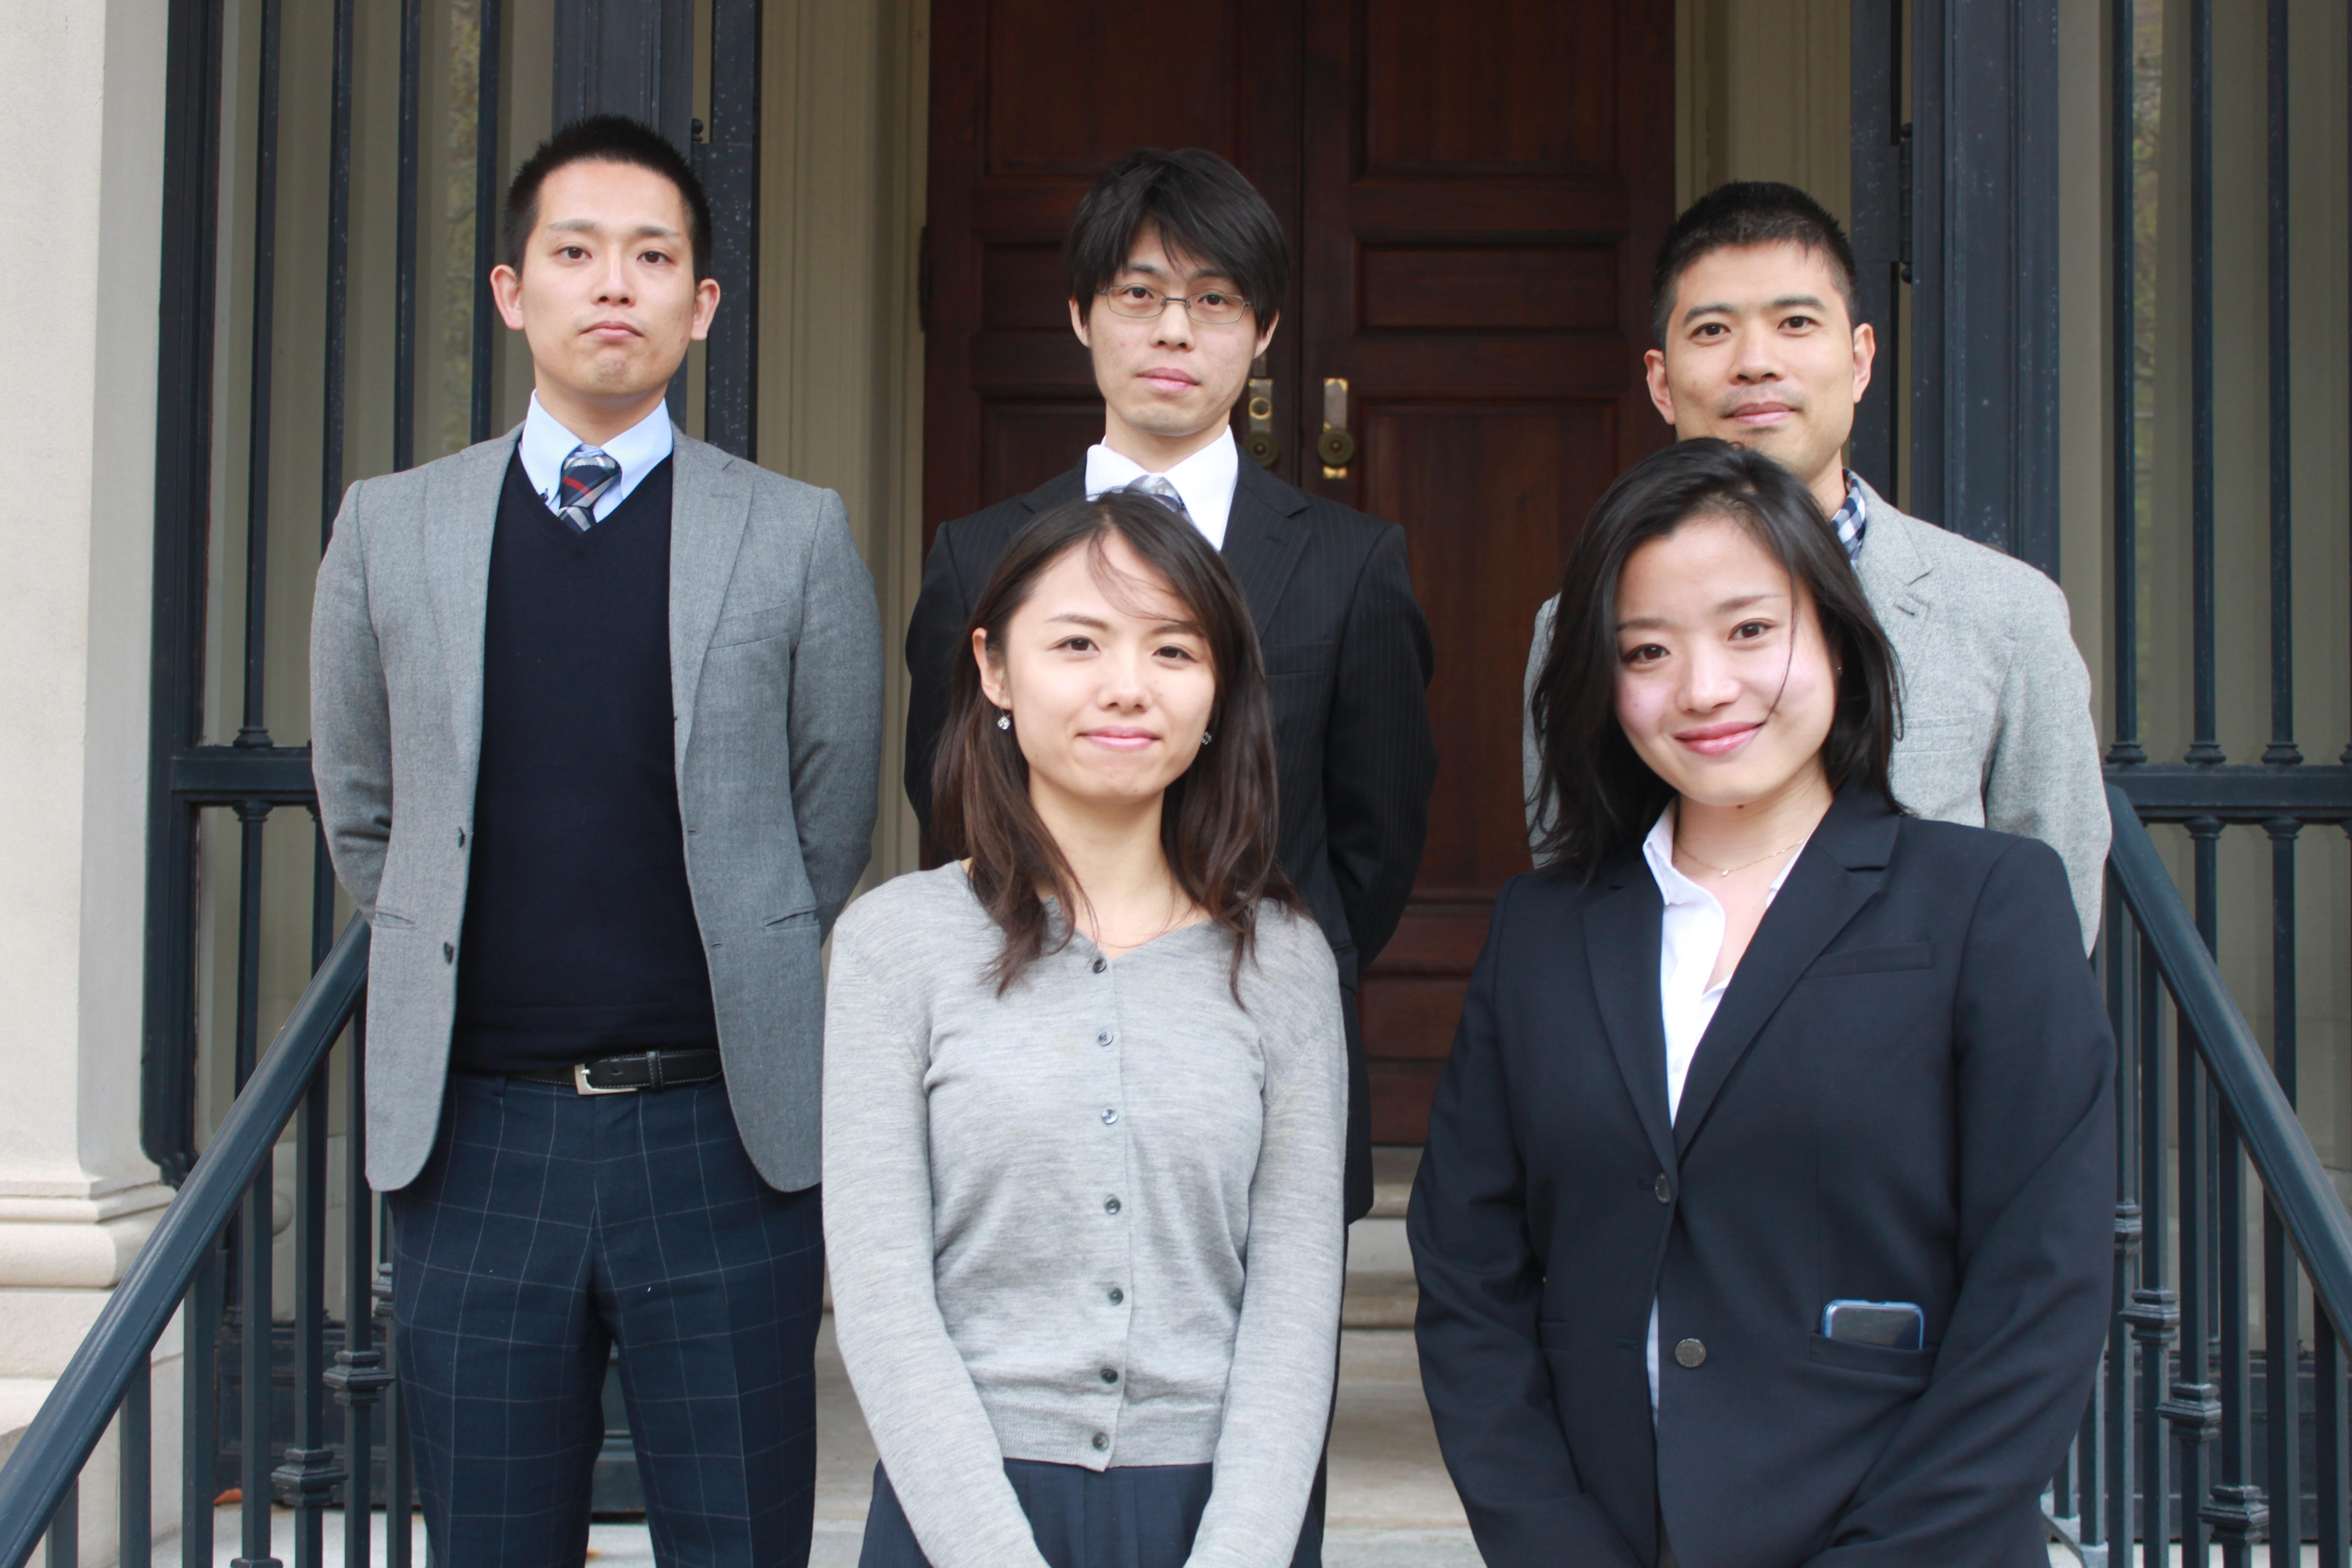 G3P Japanese Fellows preparing for their program following an opening at Meridian International Center (from left to right) (Top): Nao Takada, Hideaki Kikuchi, and Toshiyuki Igarashi; (Botton) Reiko Yui and Akane Nakajima